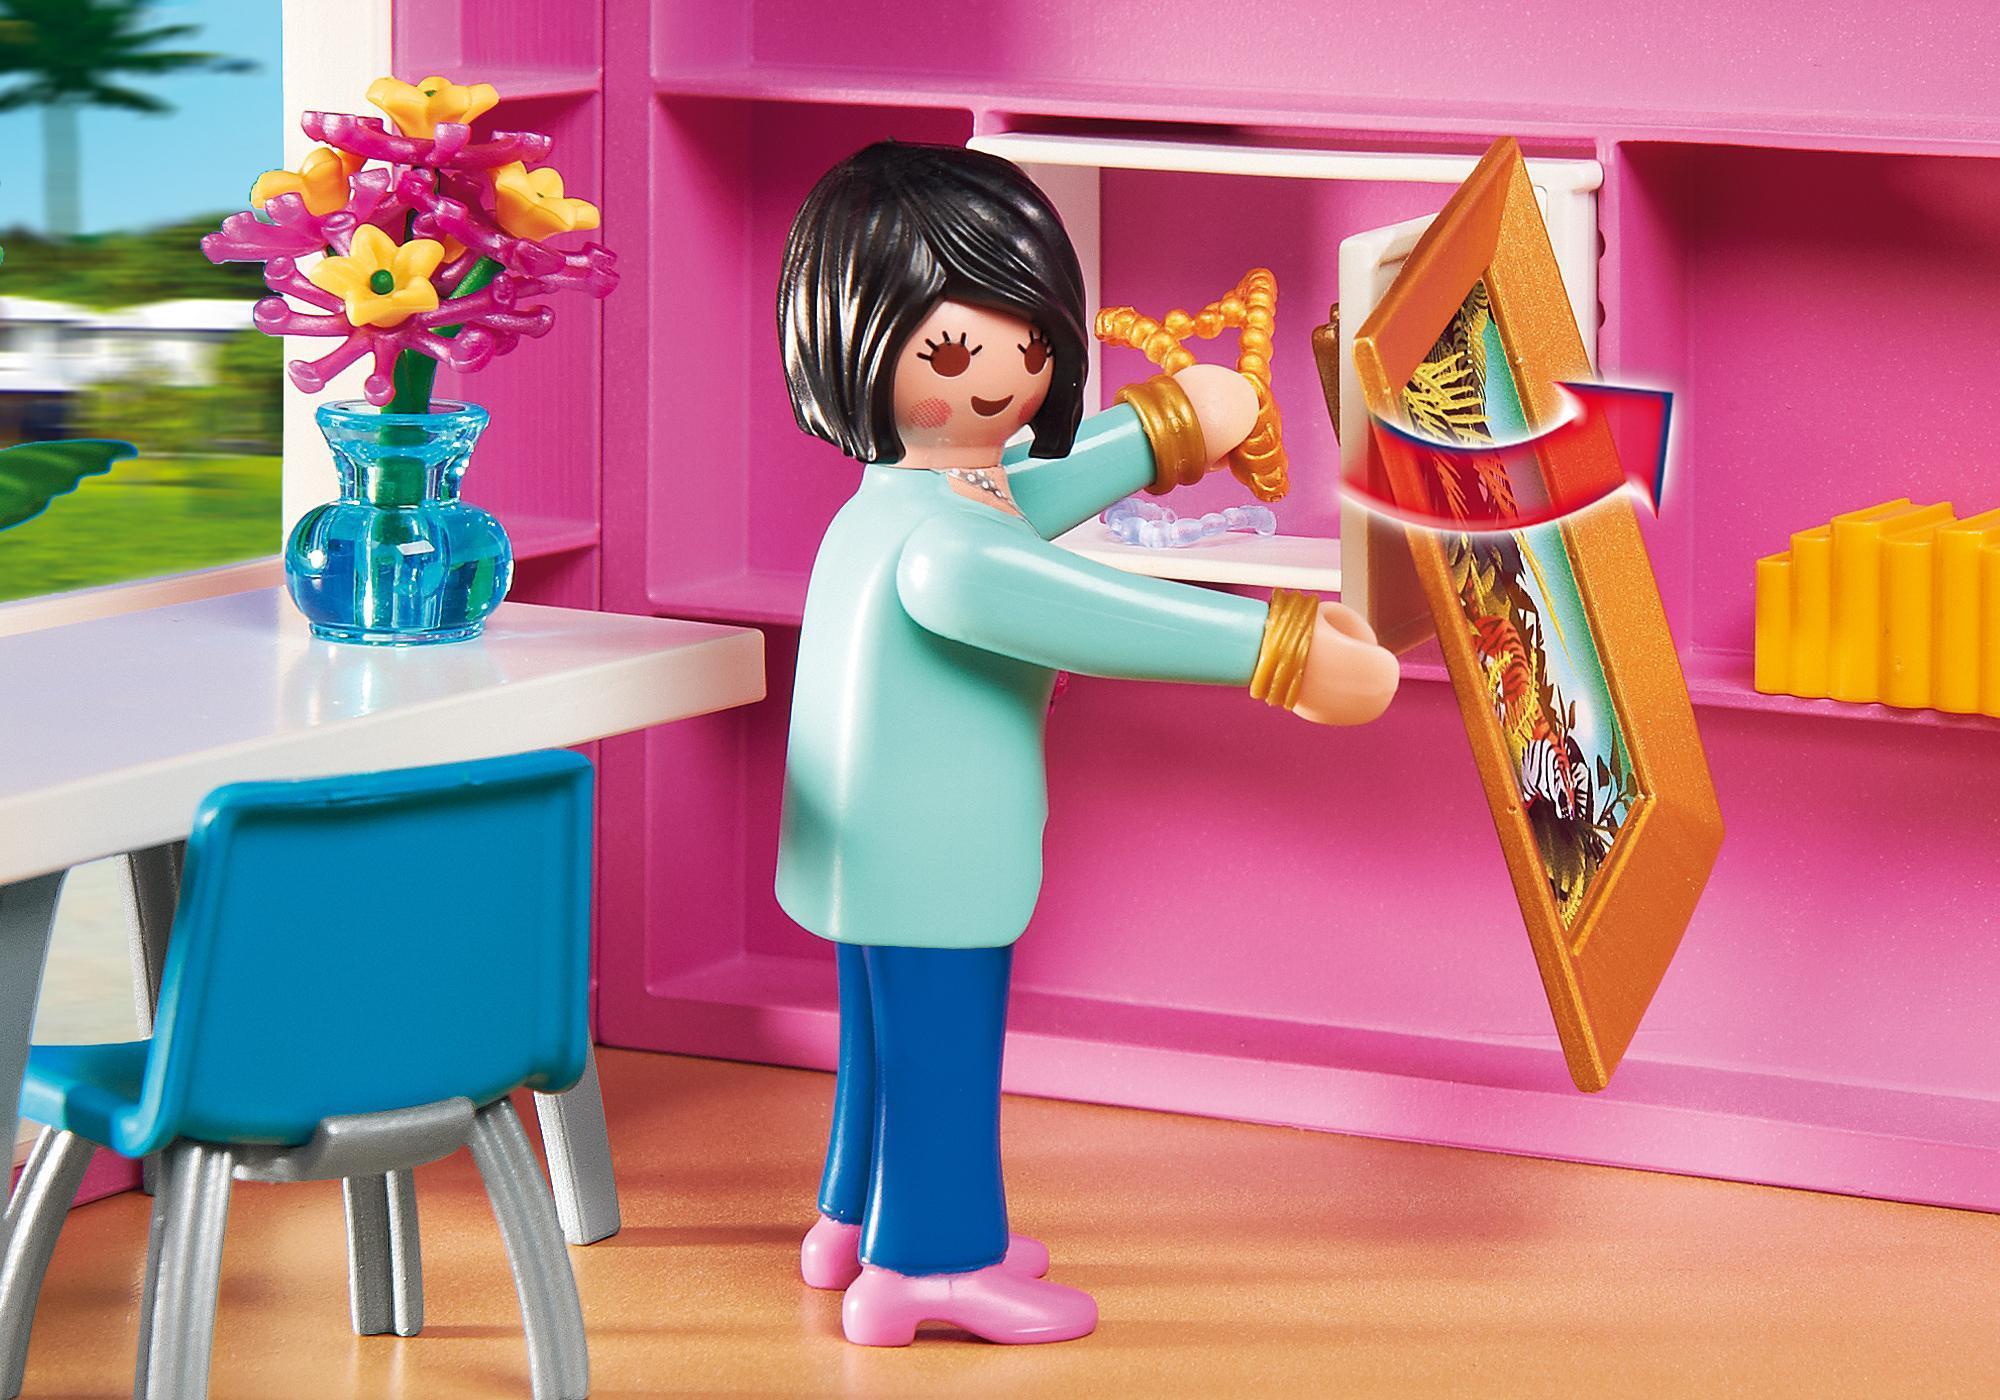 http://media.playmobil.com/i/playmobil/5574_product_extra2/Lussuosa villa arredata